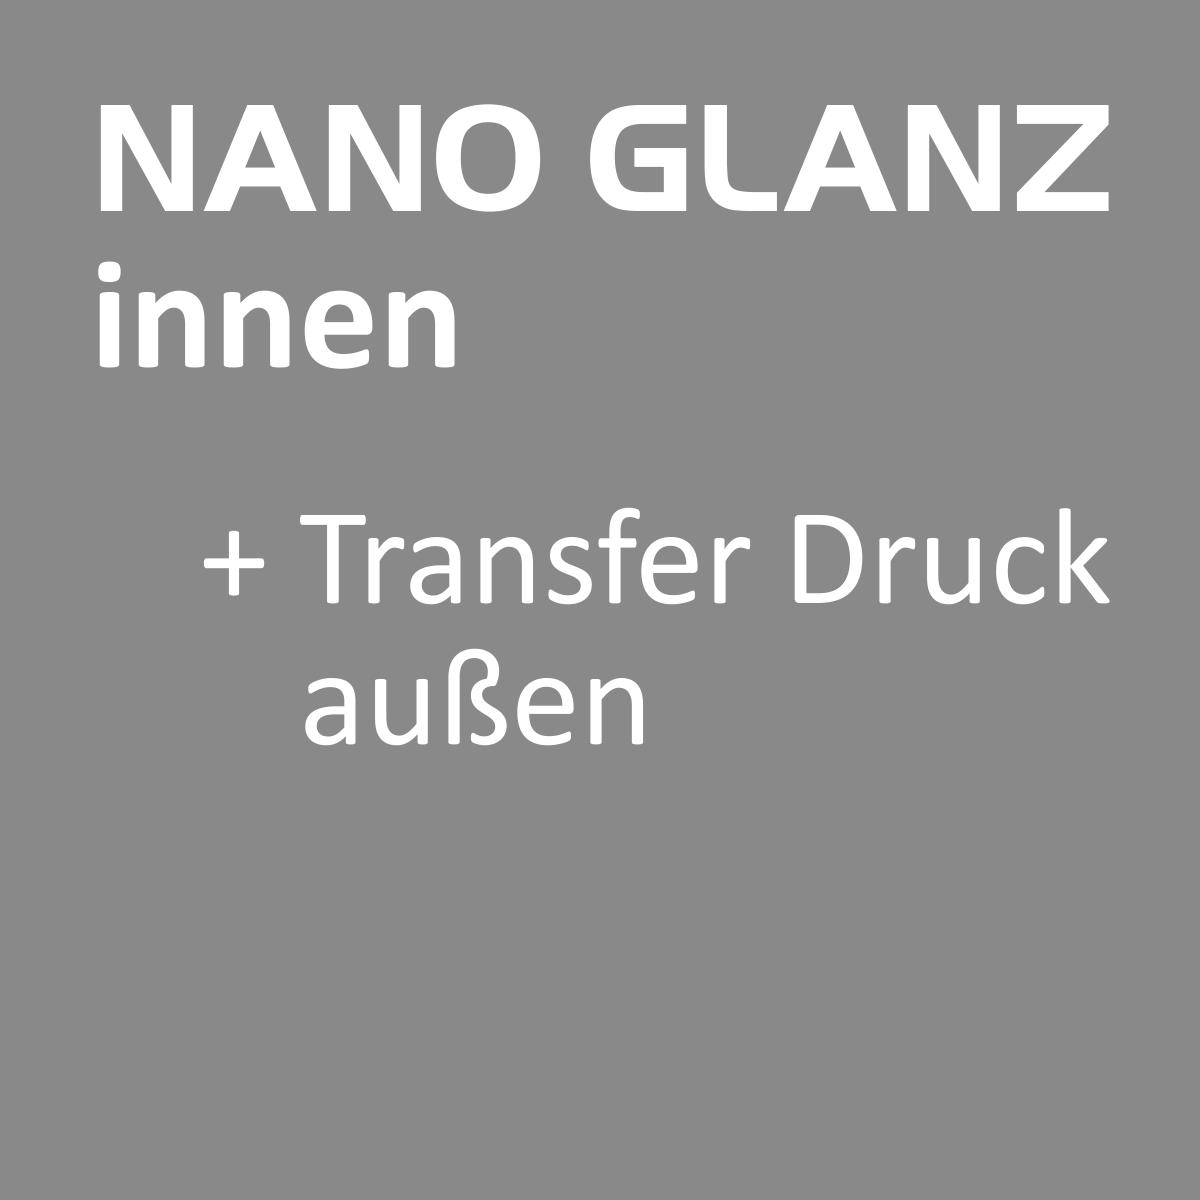 Nano Glanz_5 Text